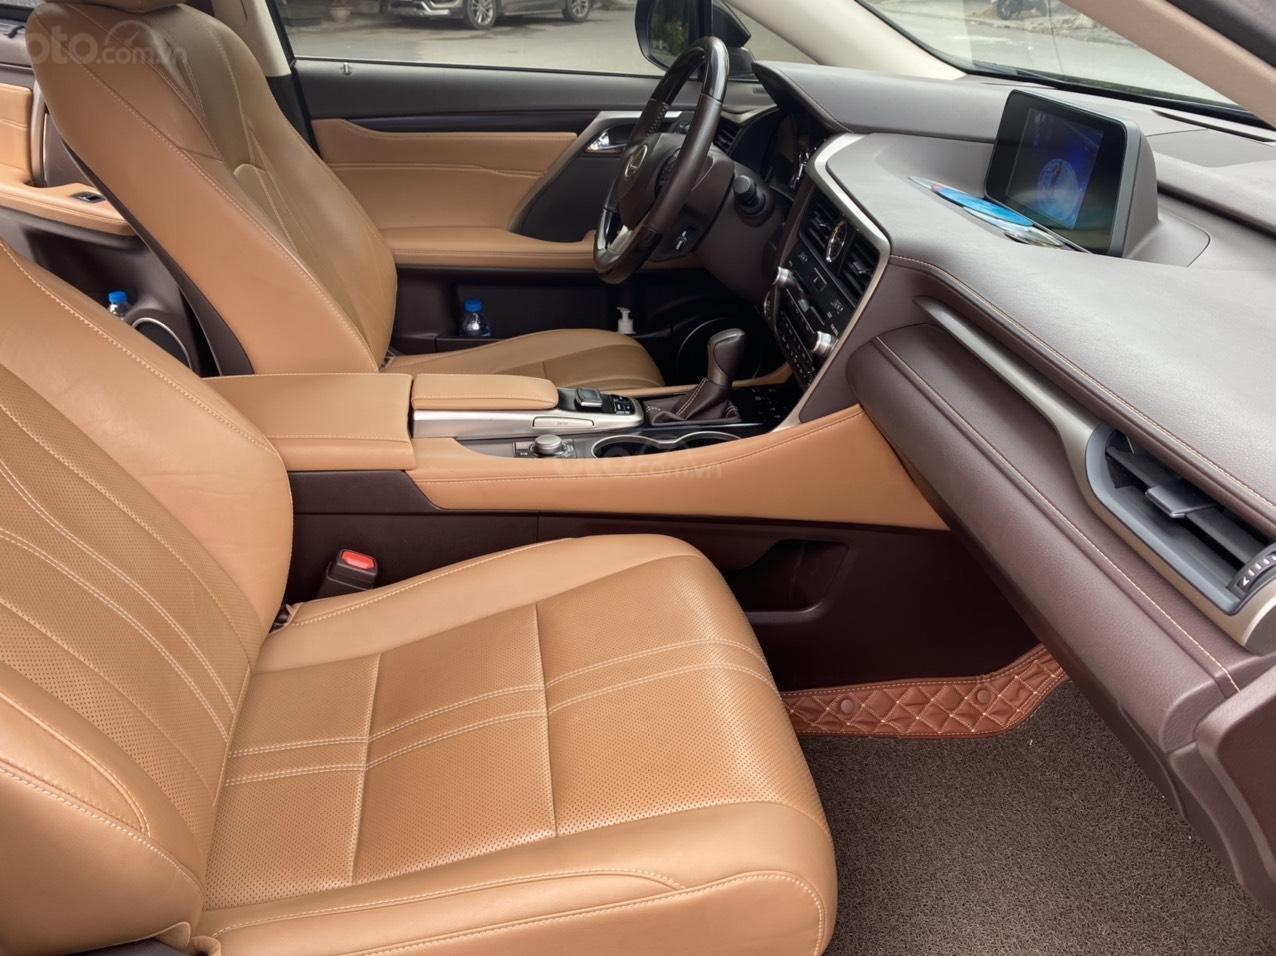 Cần bán Lexus RX 200T đời 2016 (3)